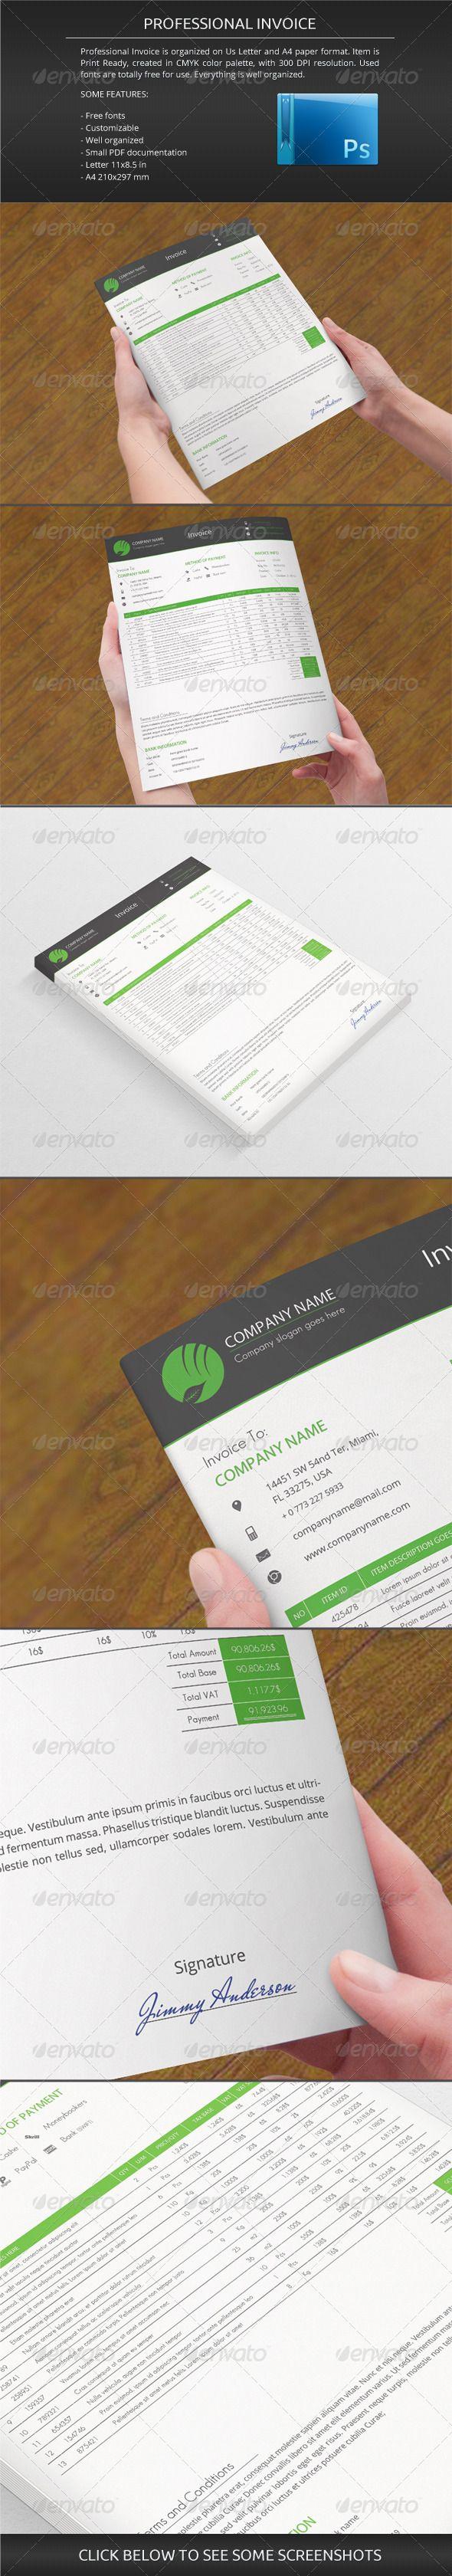 56 best invoice design images on Pinterest